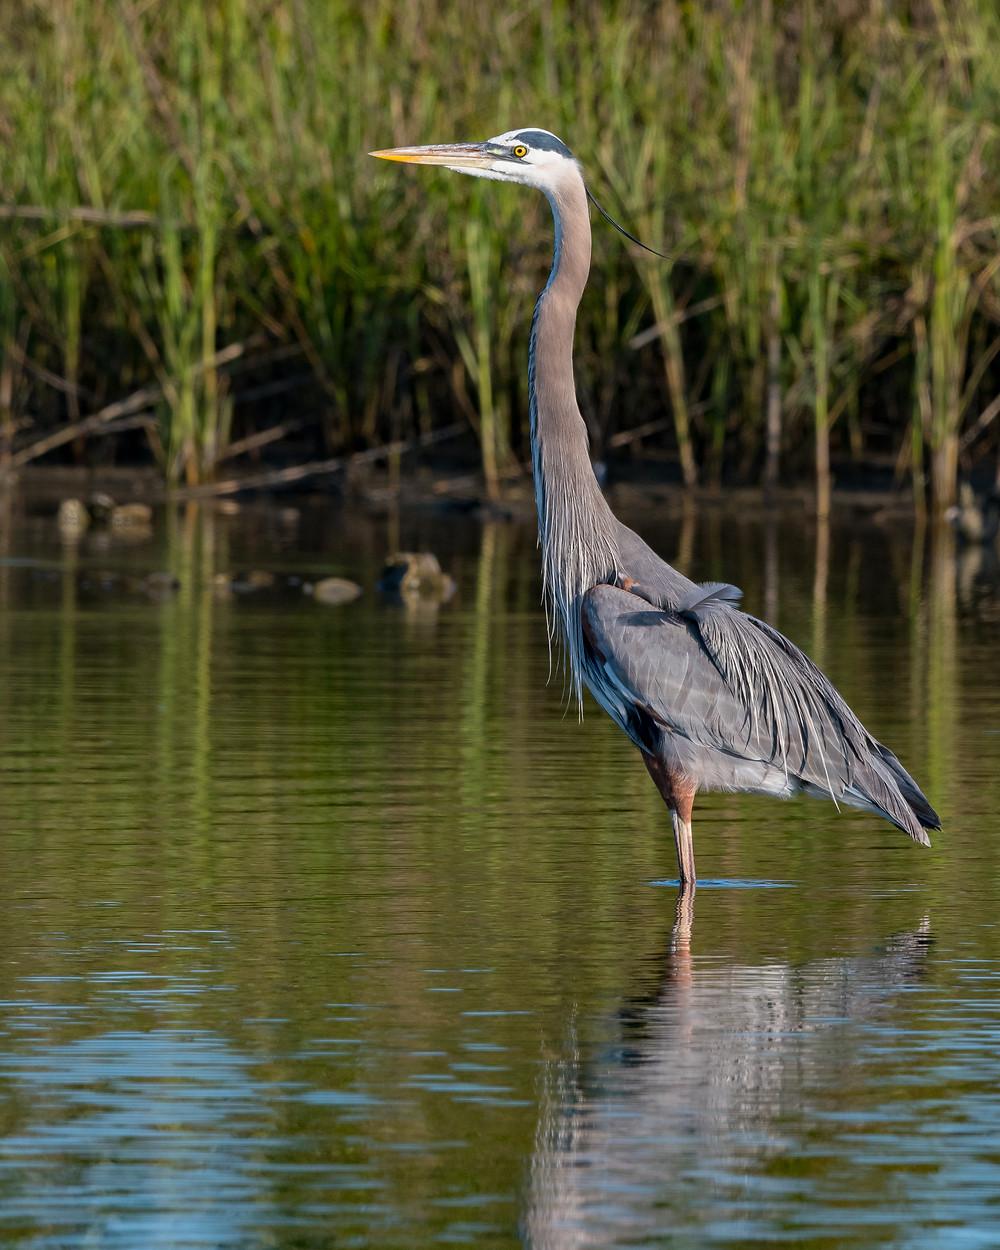 Great Blue Heron, Galveston, TX